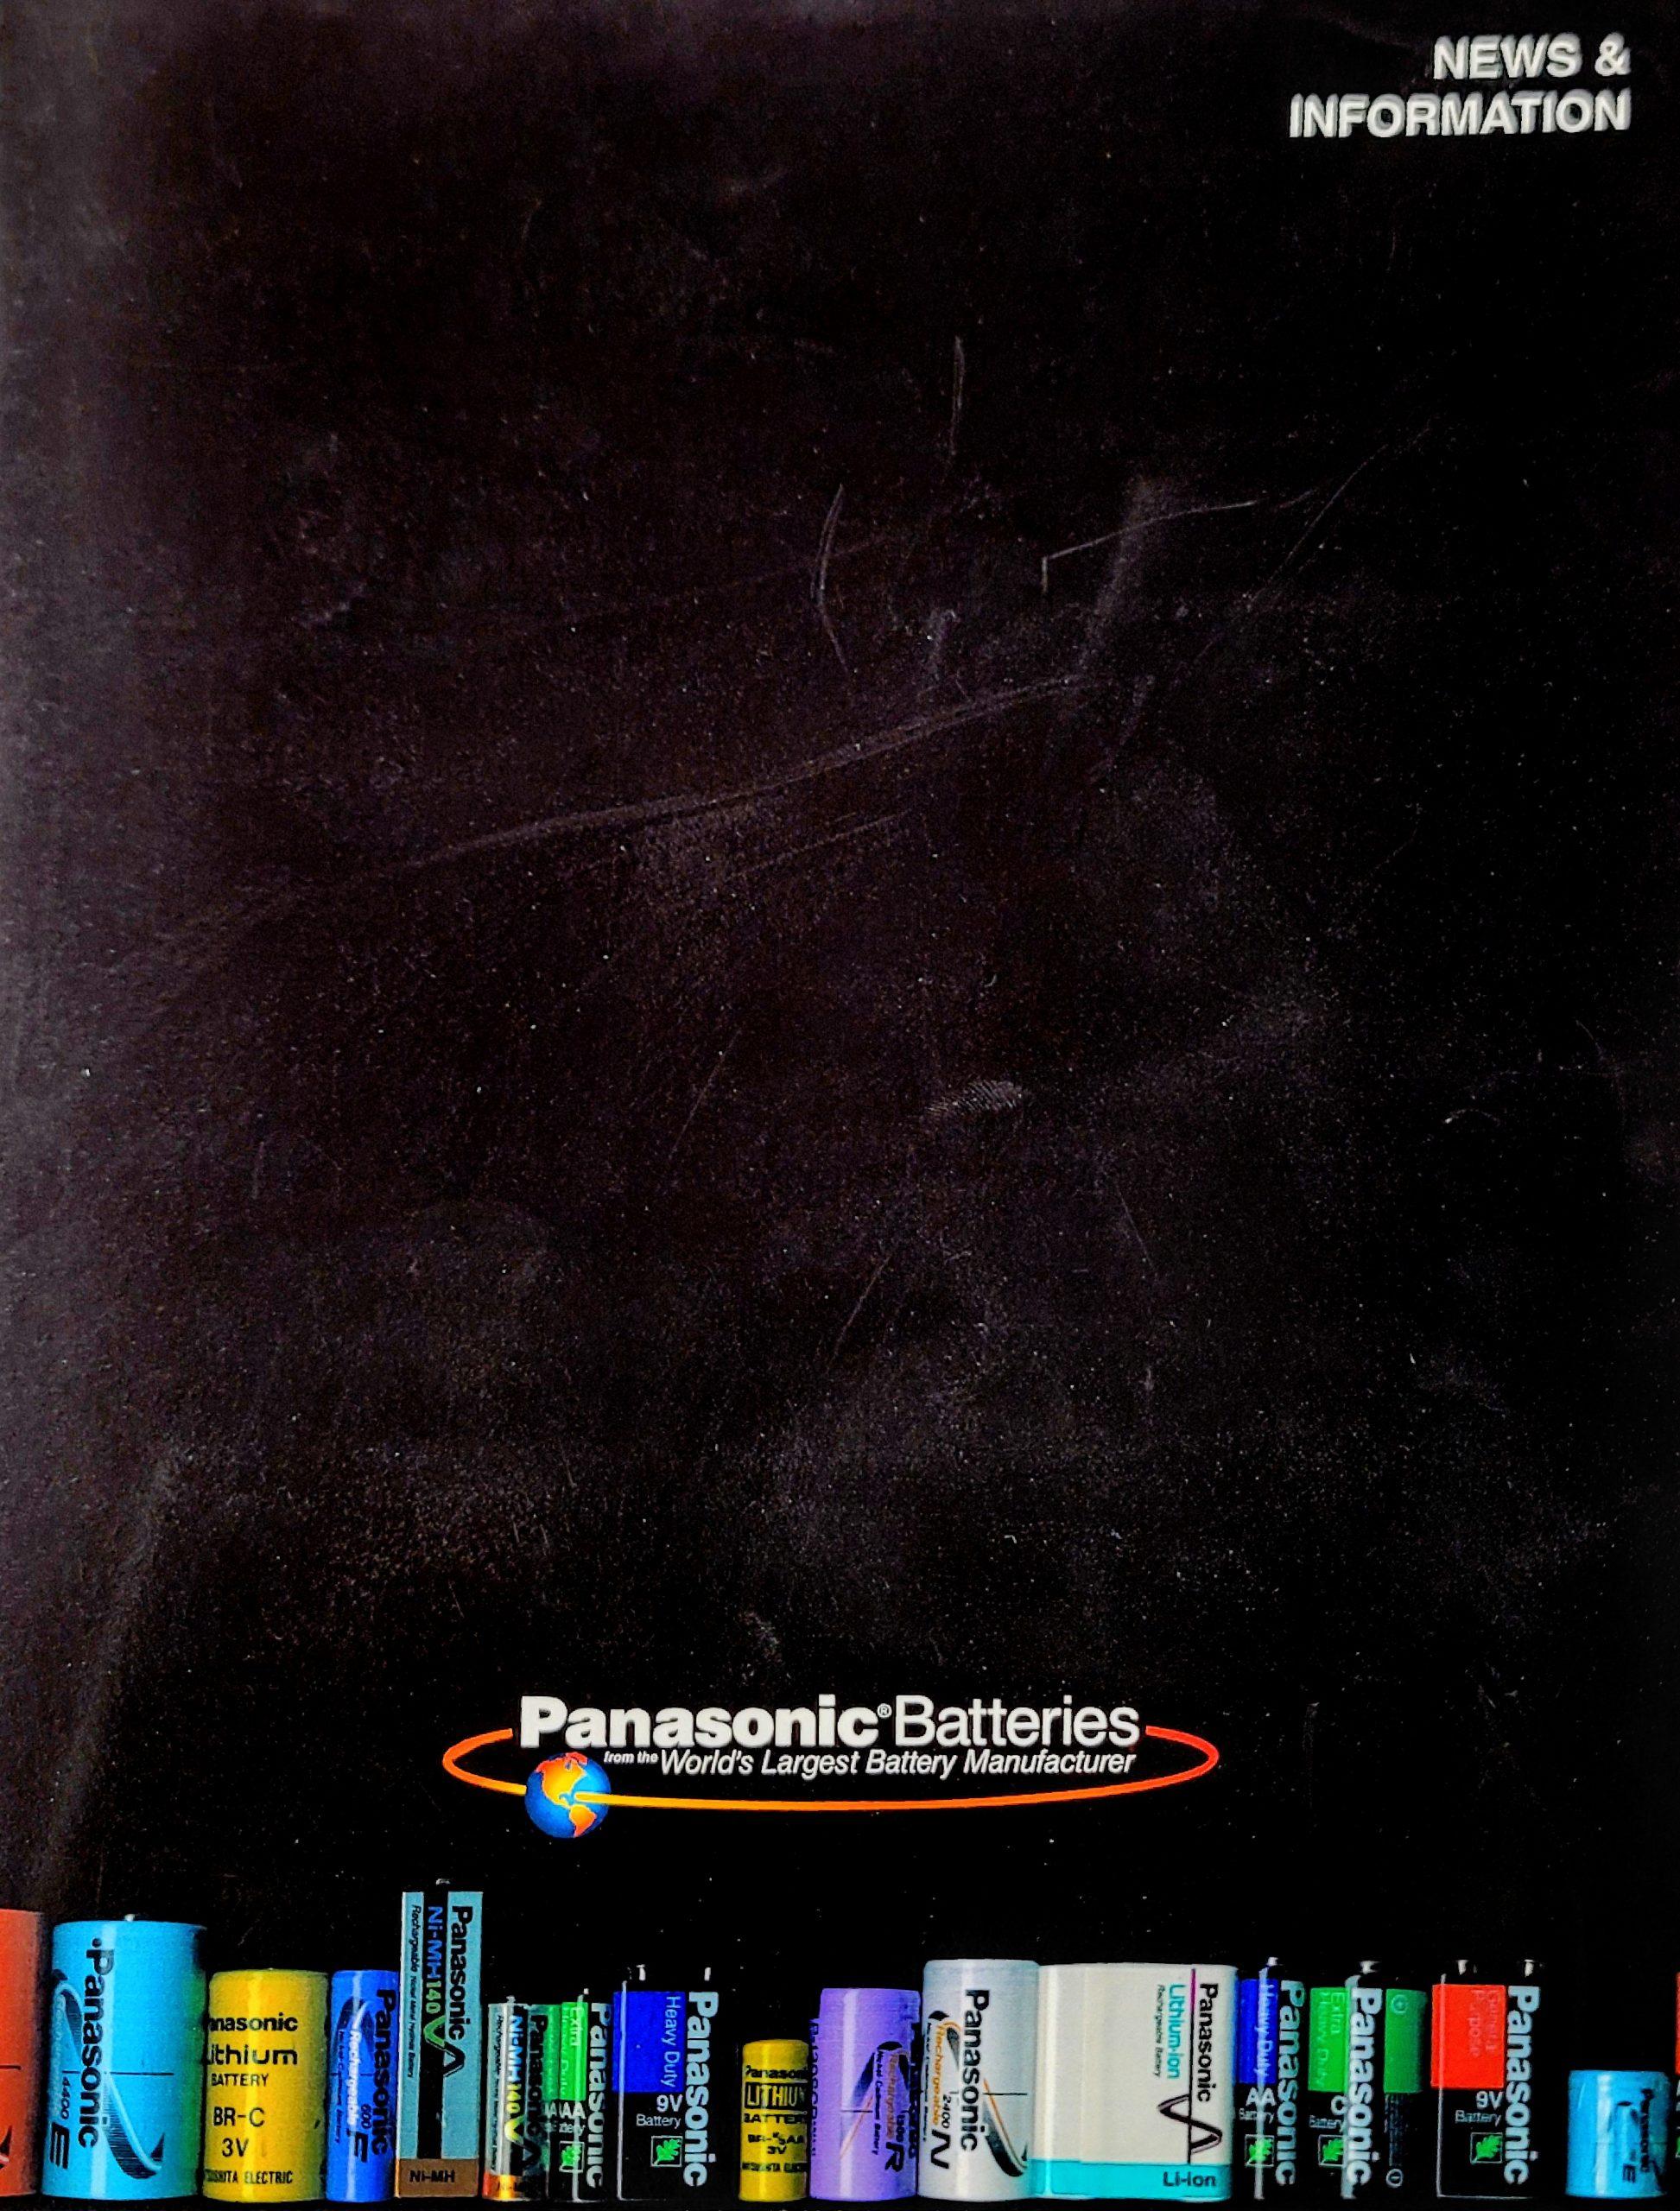 panasonic industrial_folder_26